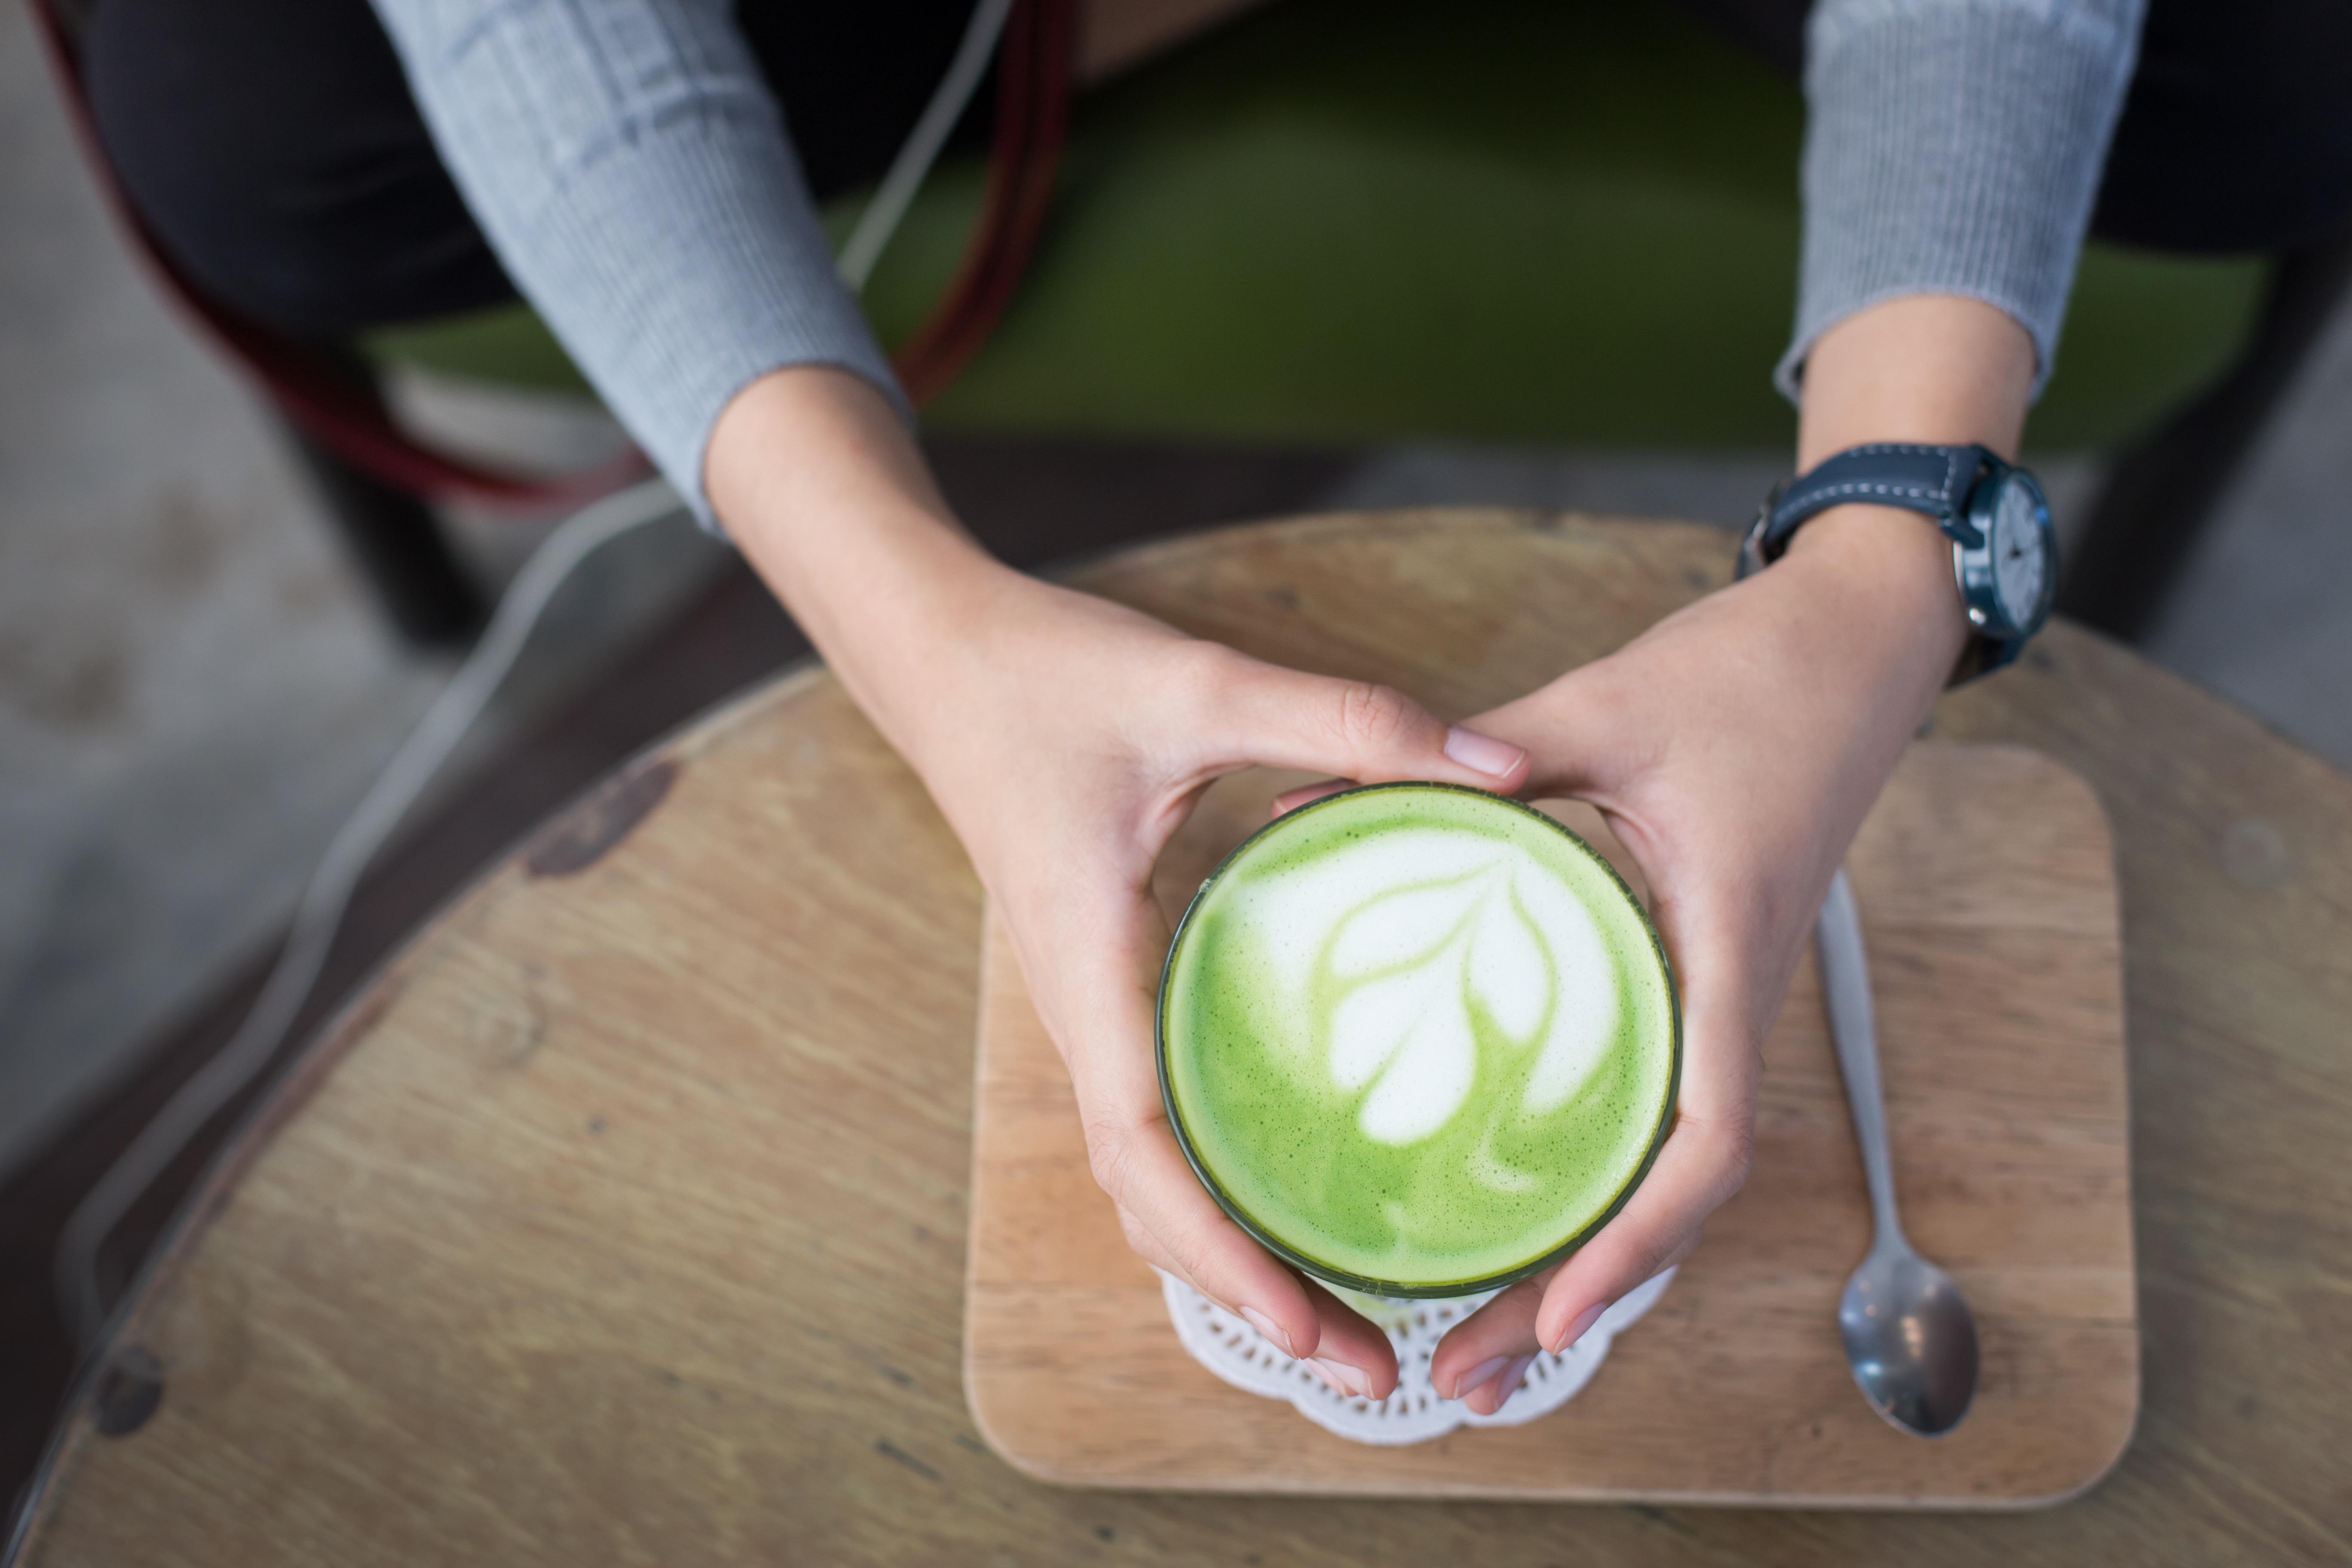 58133 download wallpaper Food, Coffee, Latte, Mint, Hands, Foam, Meerschaum screensavers and pictures for free